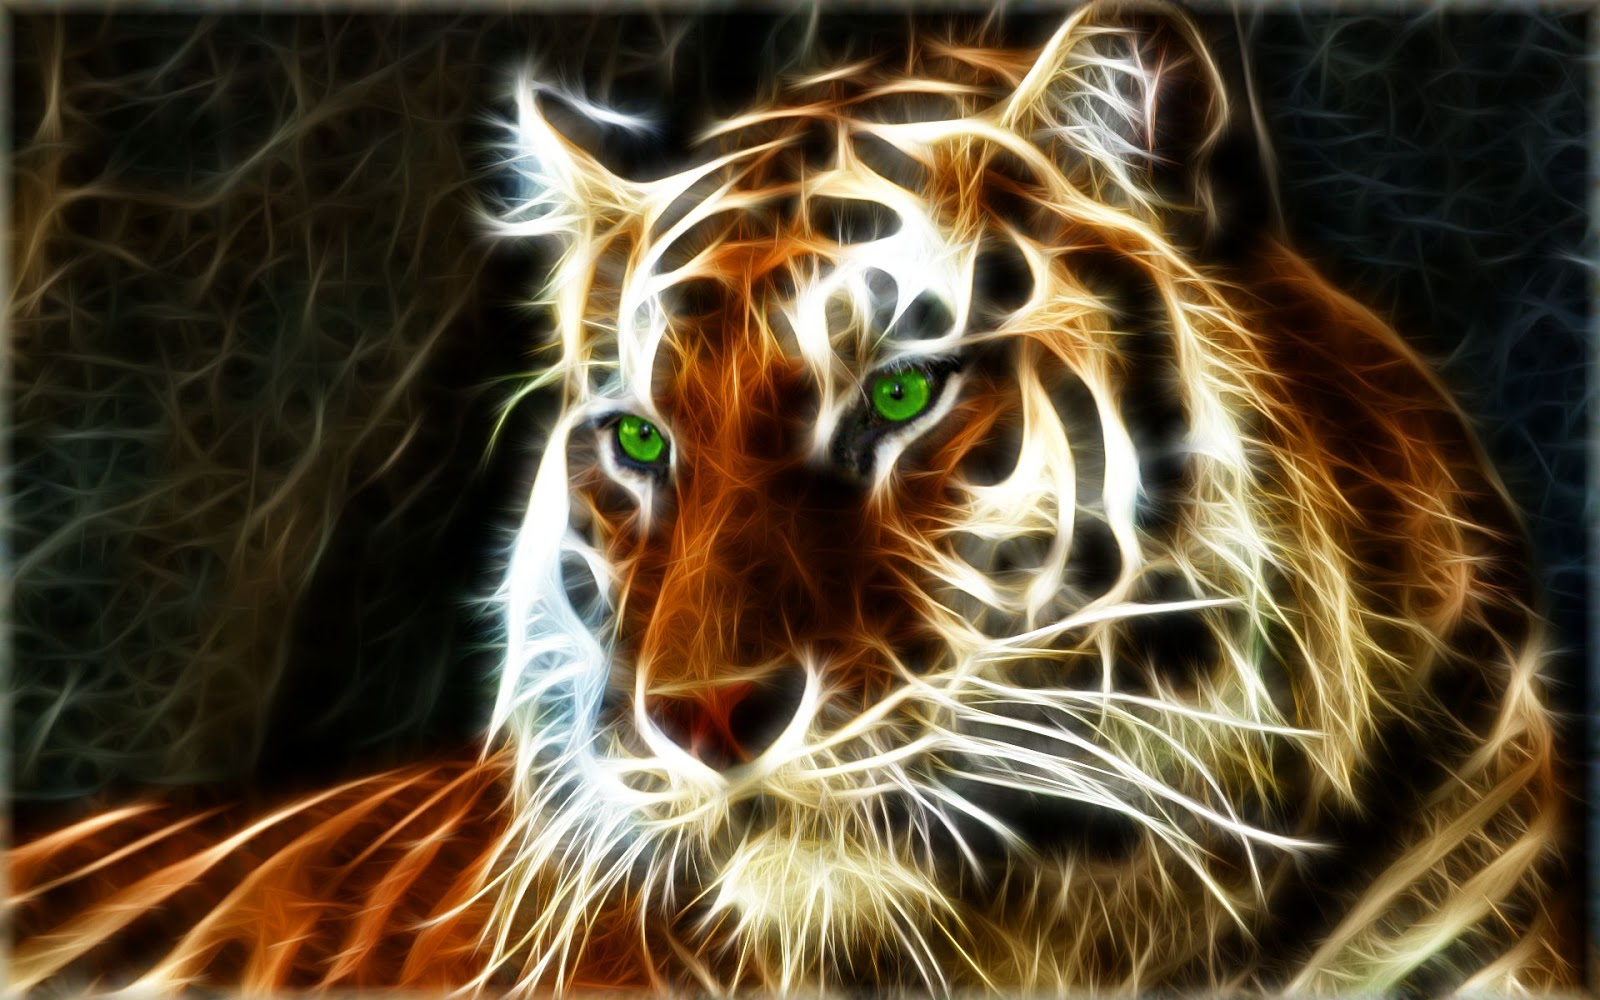 Tigre 3d 1920x1080 fonds d 39 cran hd for Wallpaper pour ordinateur